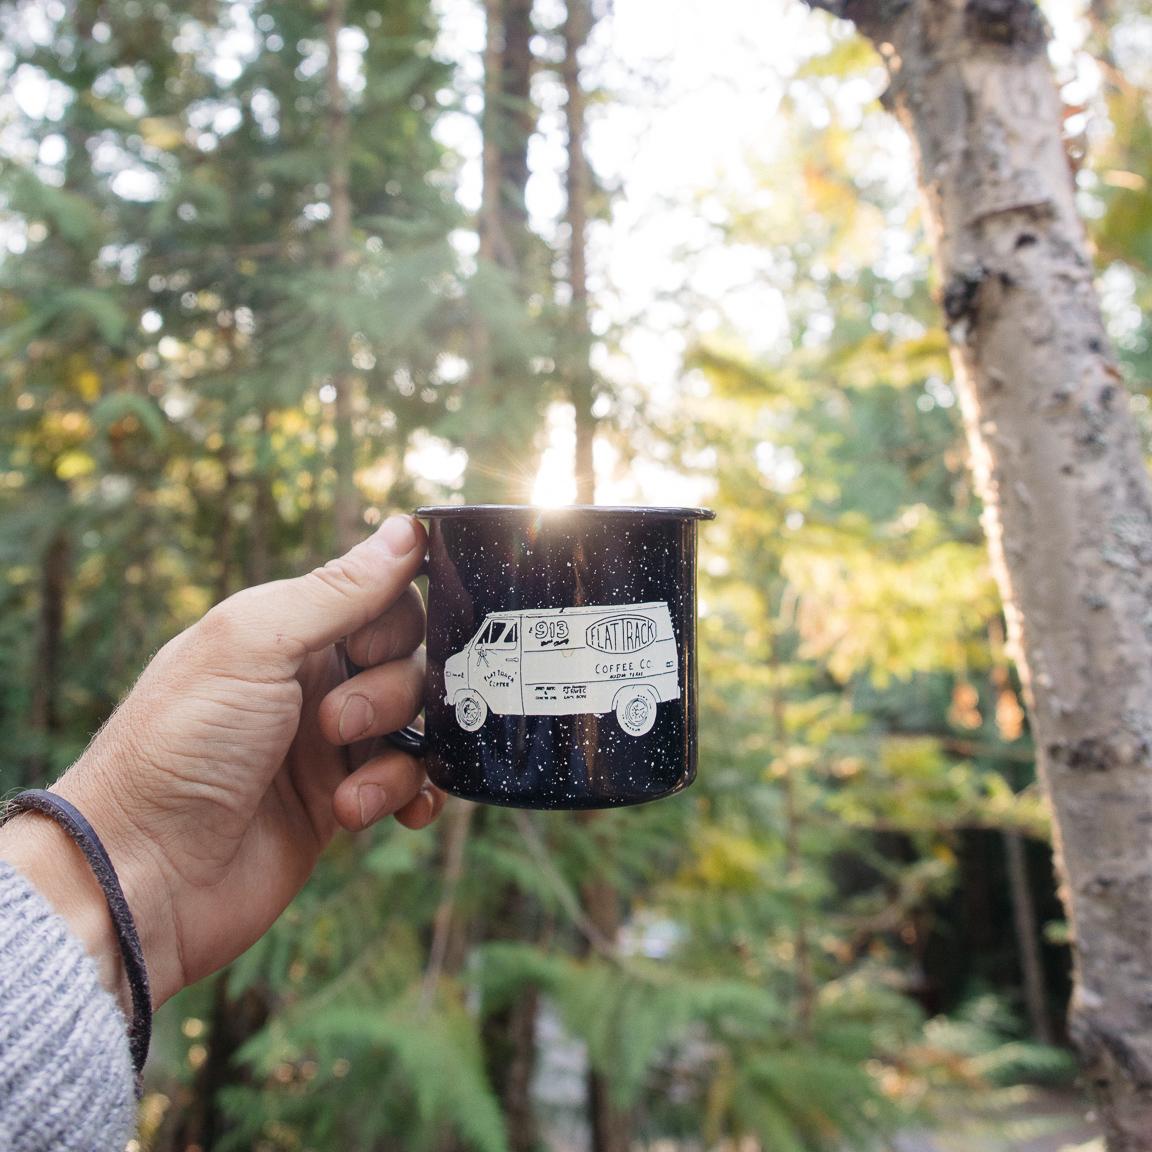 montana flathead camp vibes glacier national park america yall pawlowski vsco flat track coffee